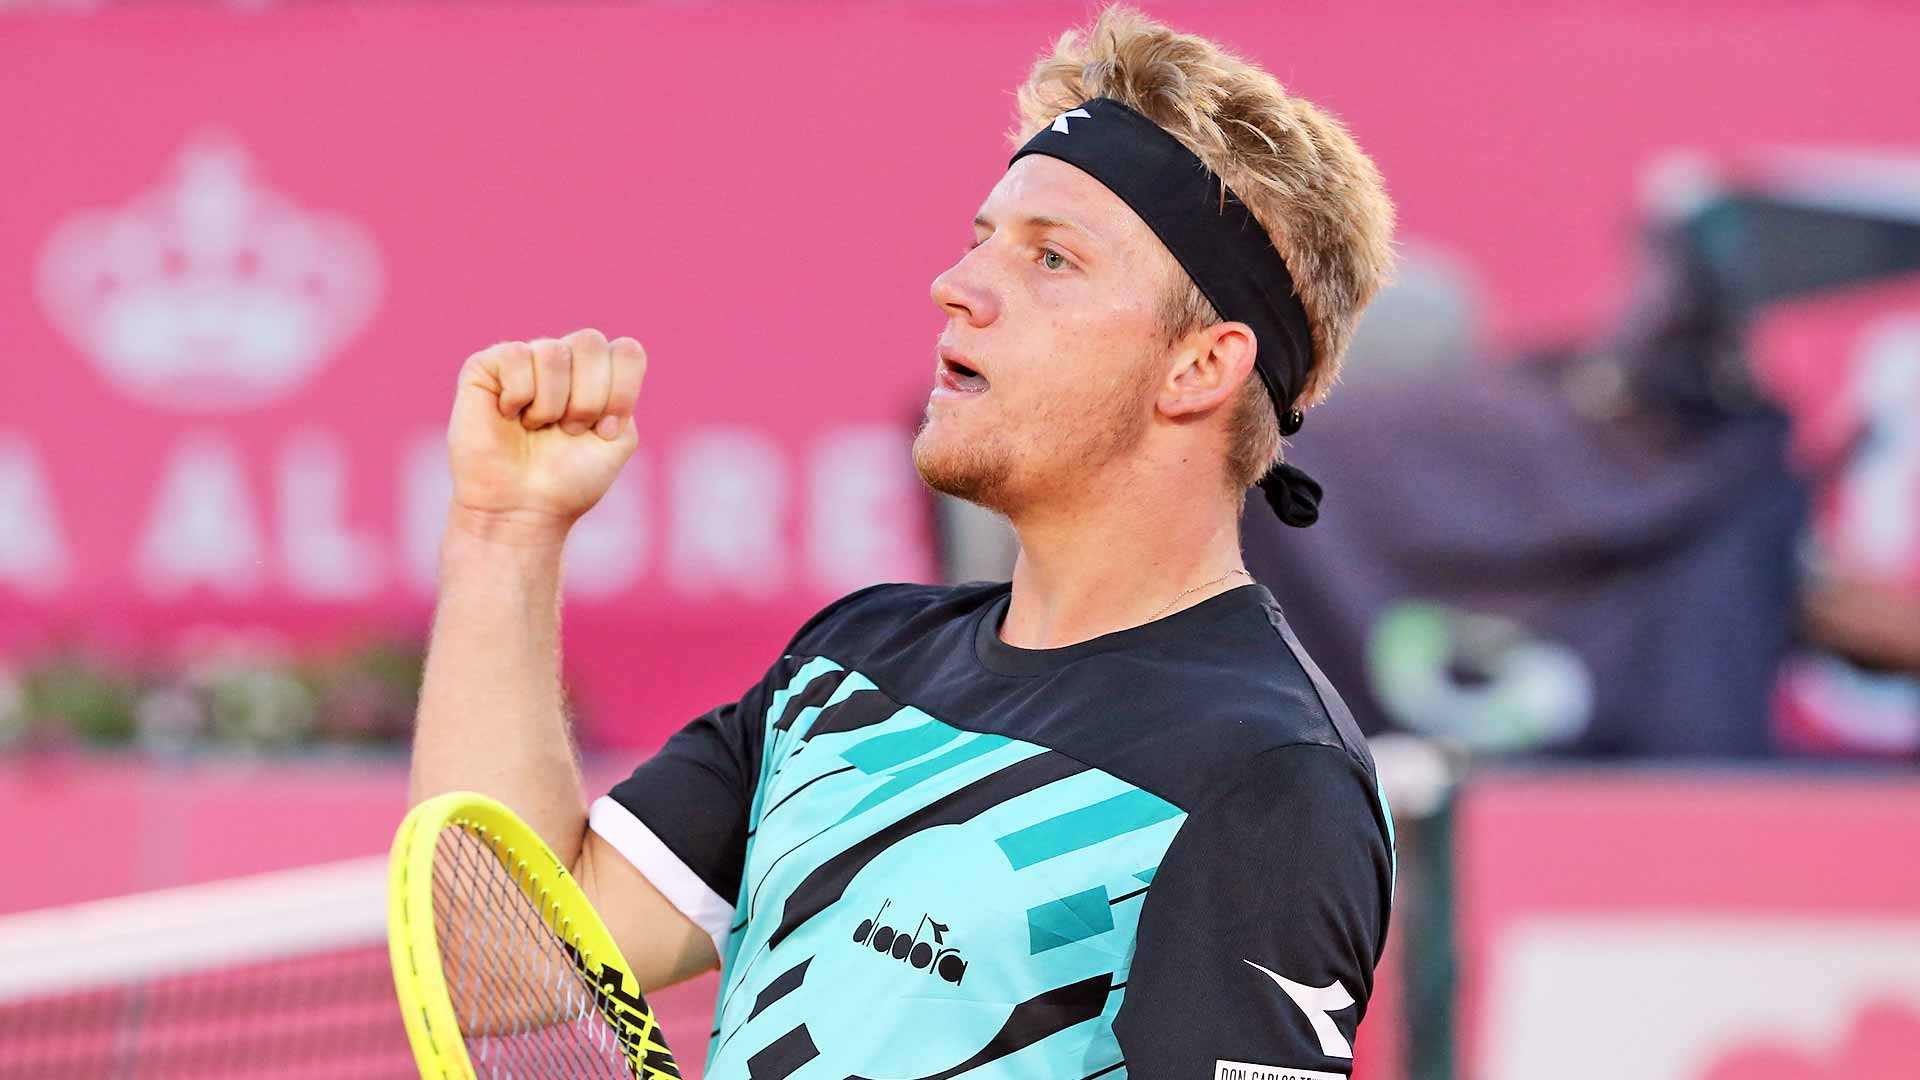 Barcelona Open 2021: Alexander Bublik vs. Alejandro Davidovich Fokina Tennis Pick and Prediction